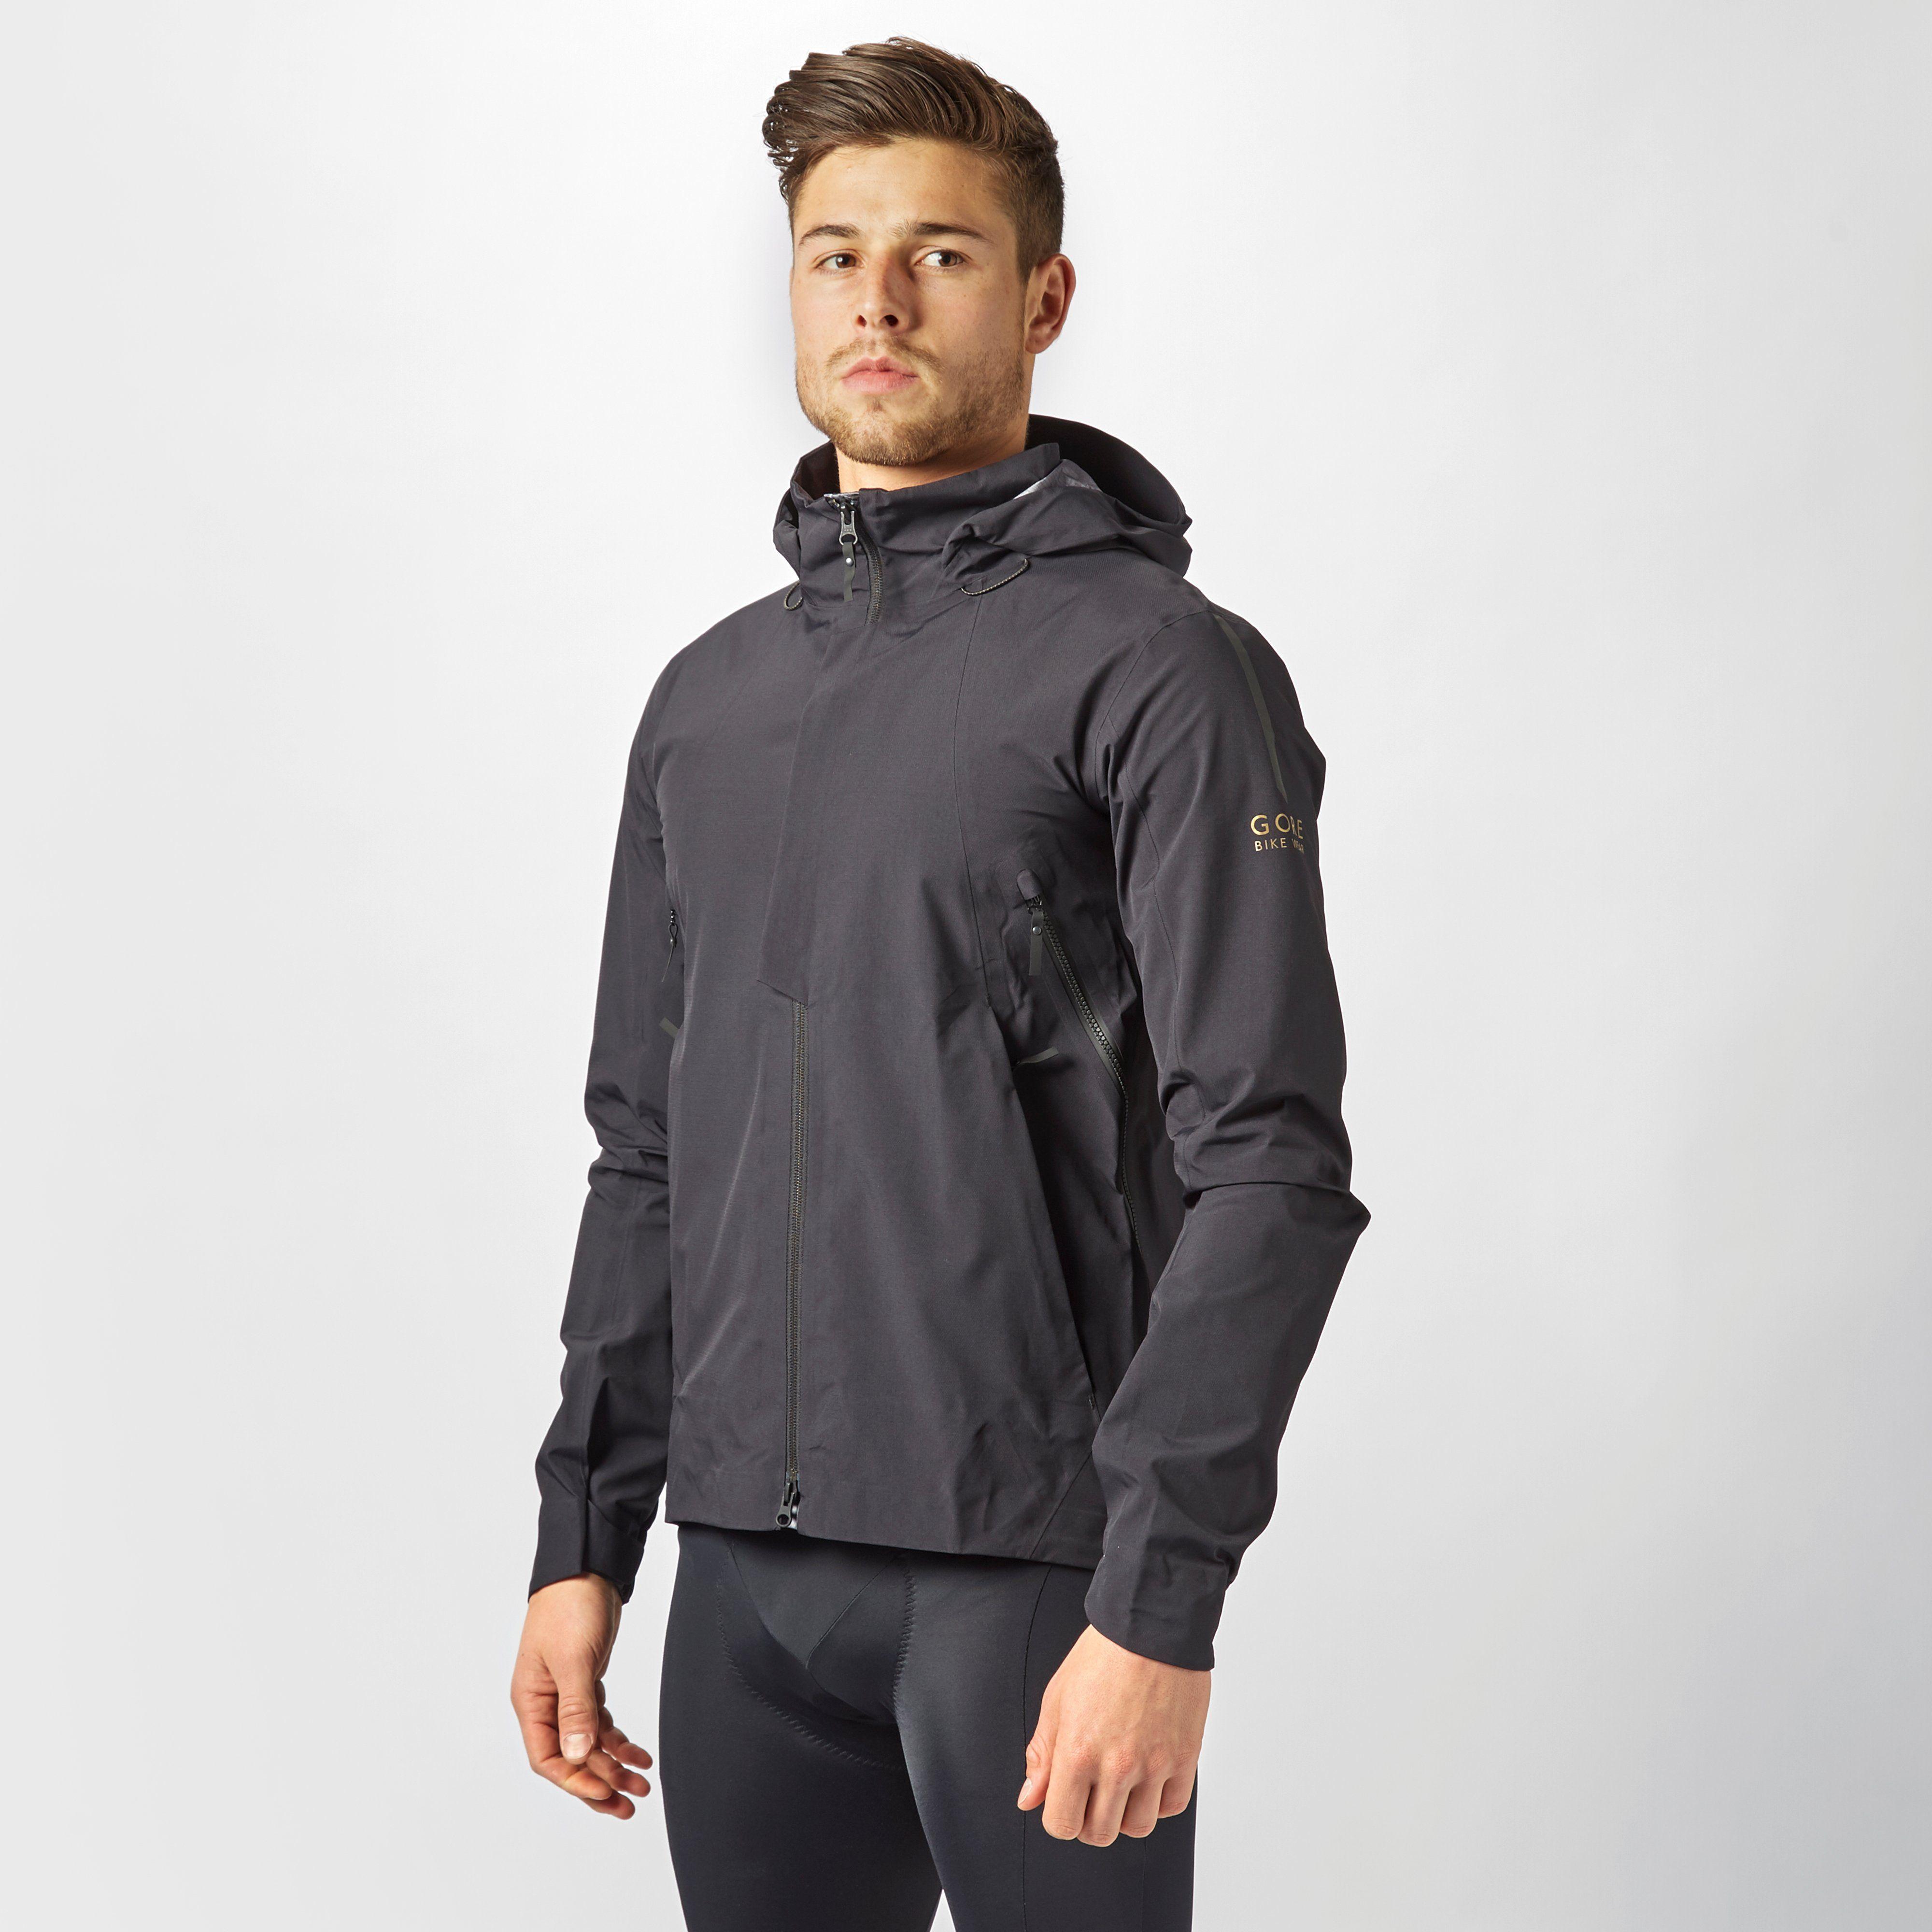 GORE Men's One GORE-TEX® Pro Jacket